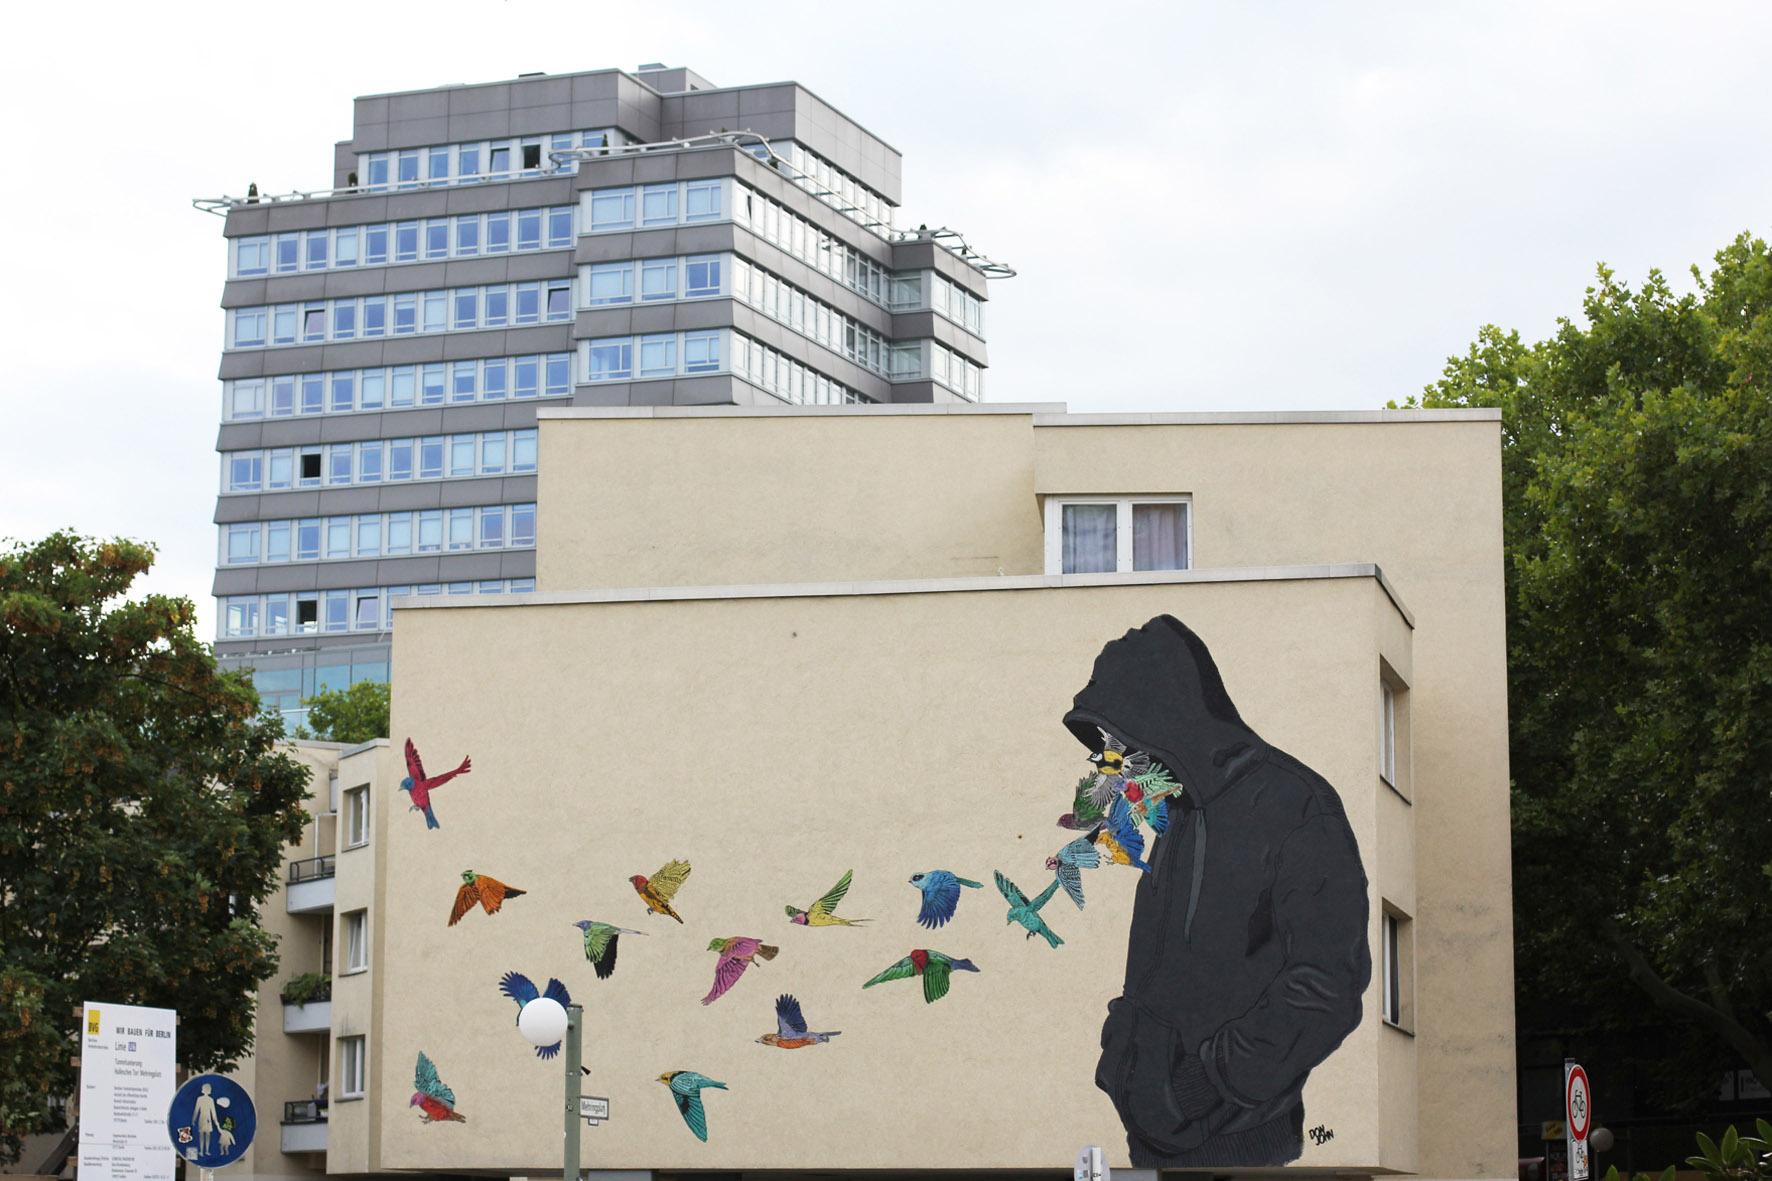 Don John Mural for Urban Nation Berlin - Berlin Love